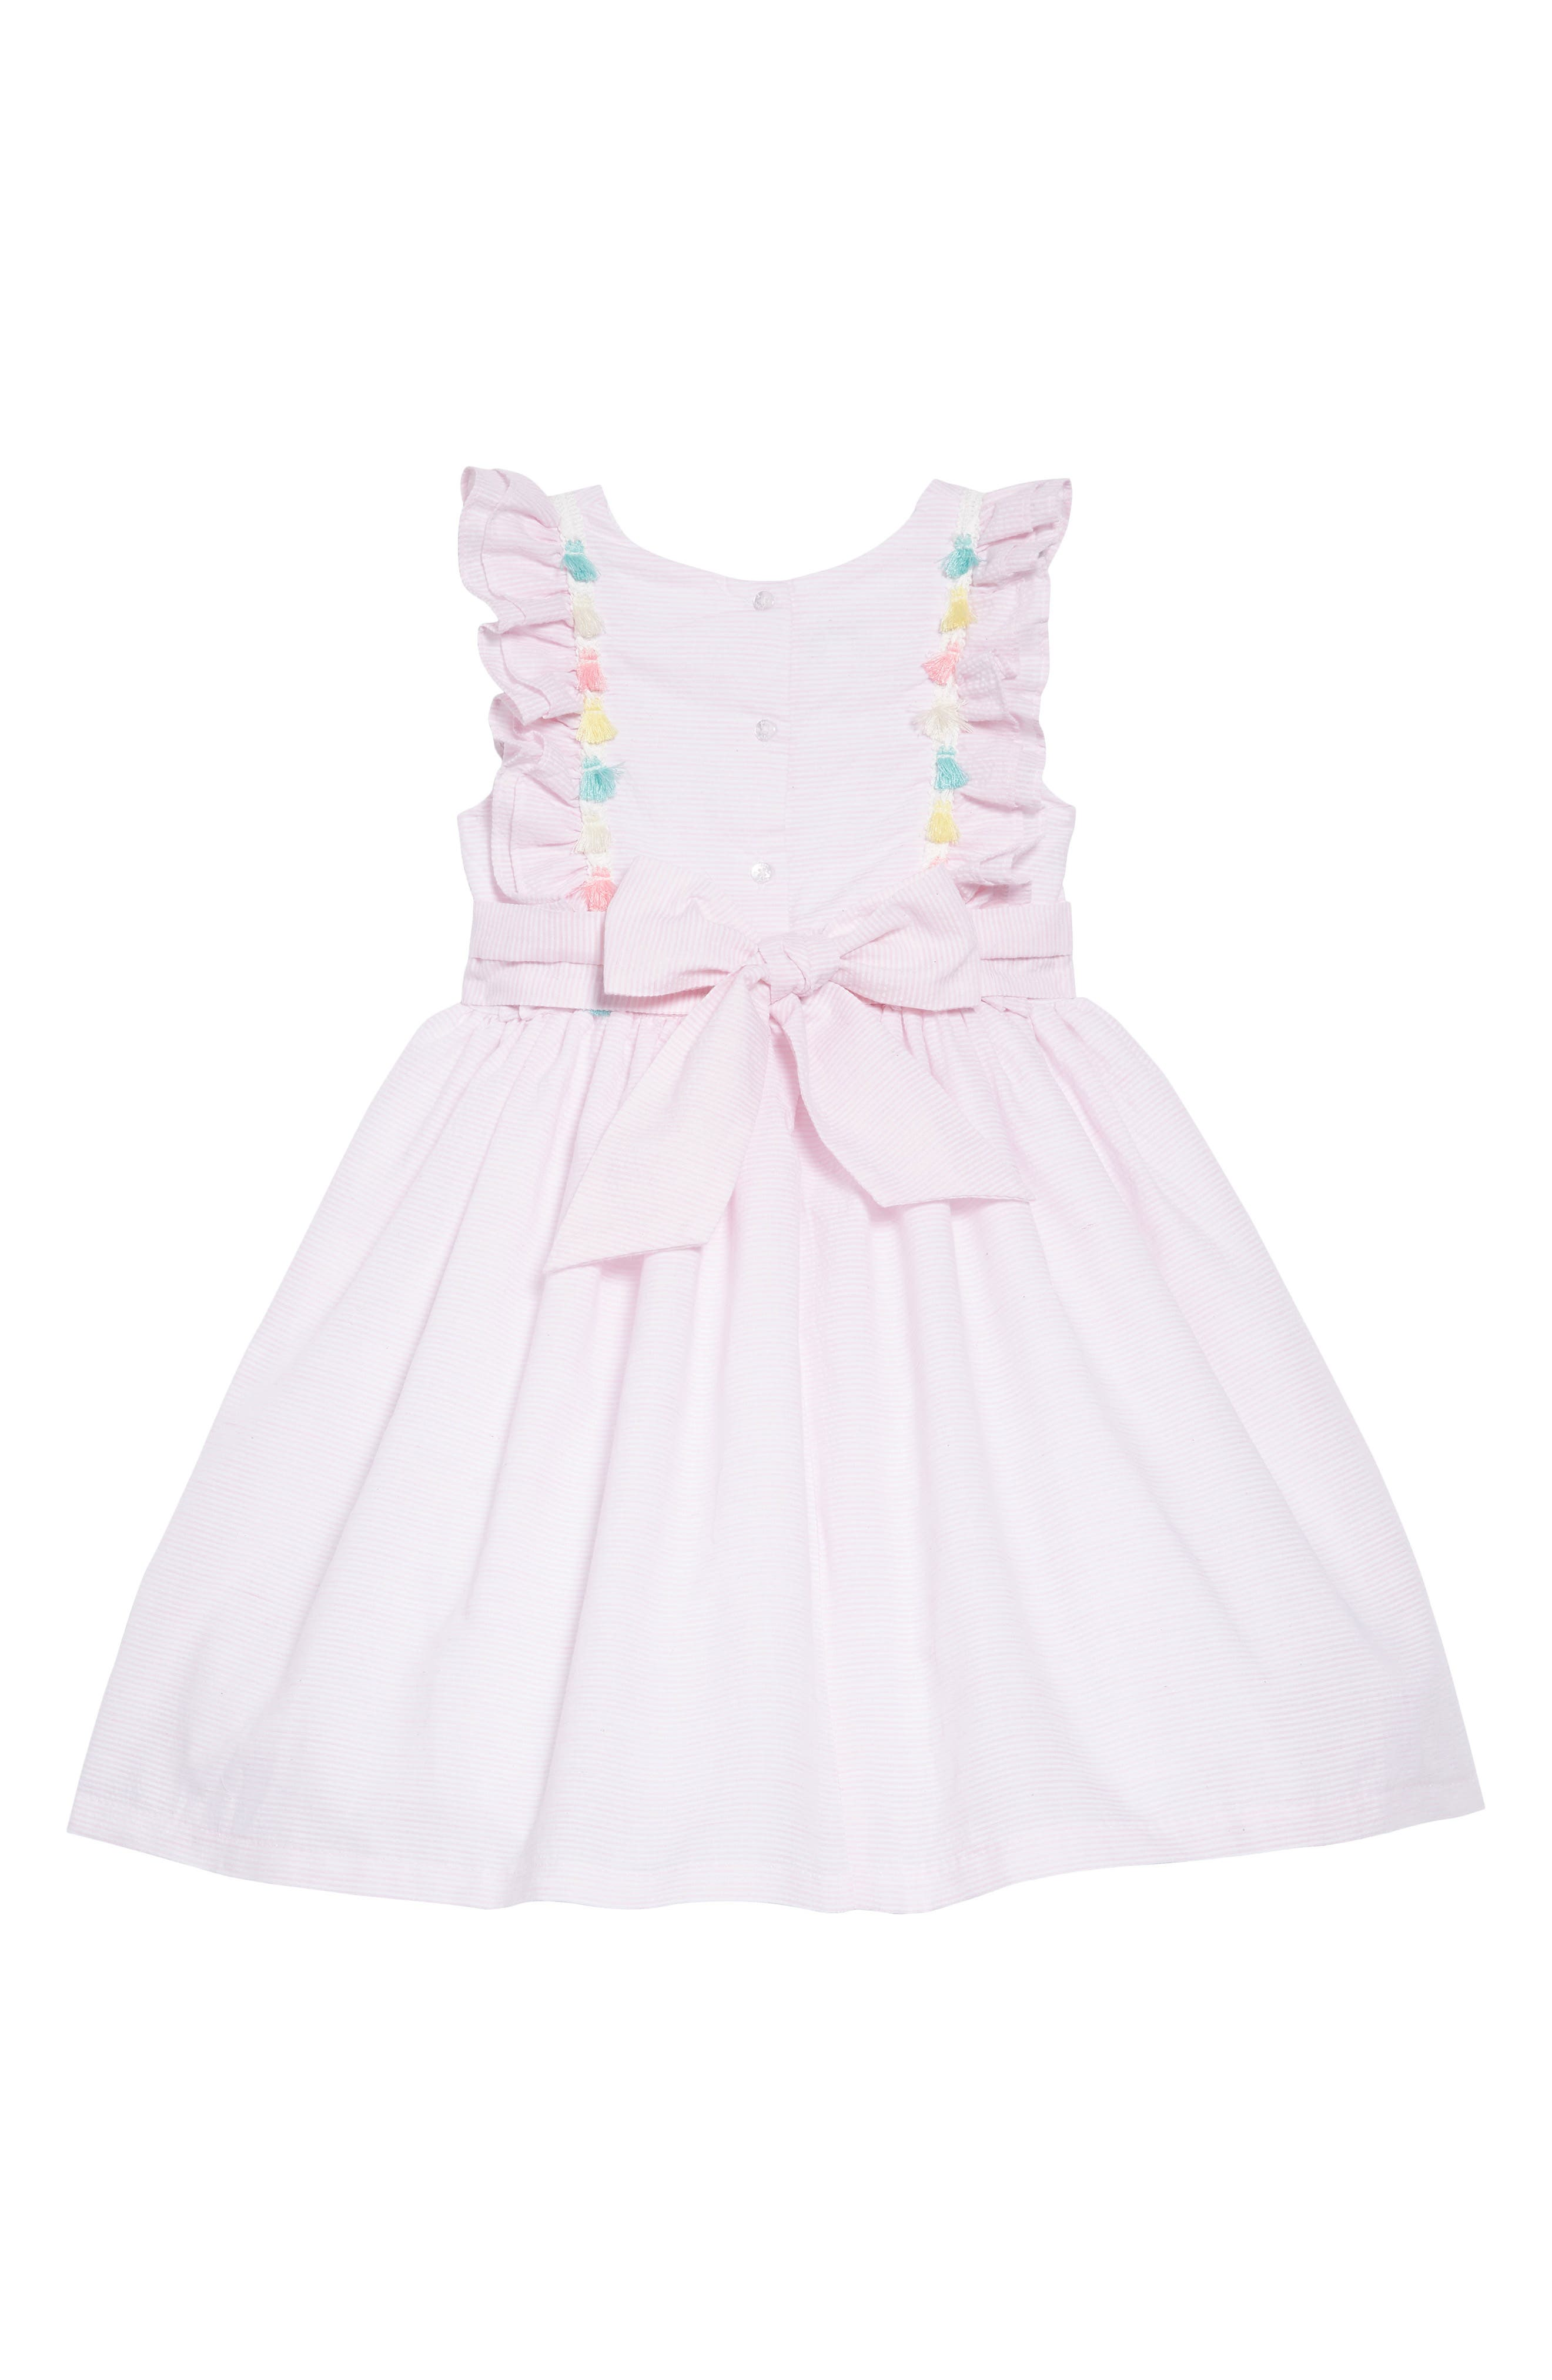 PIPPA & JULIE, Tassel Trim Seersucker Dress, Alternate thumbnail 3, color, 650